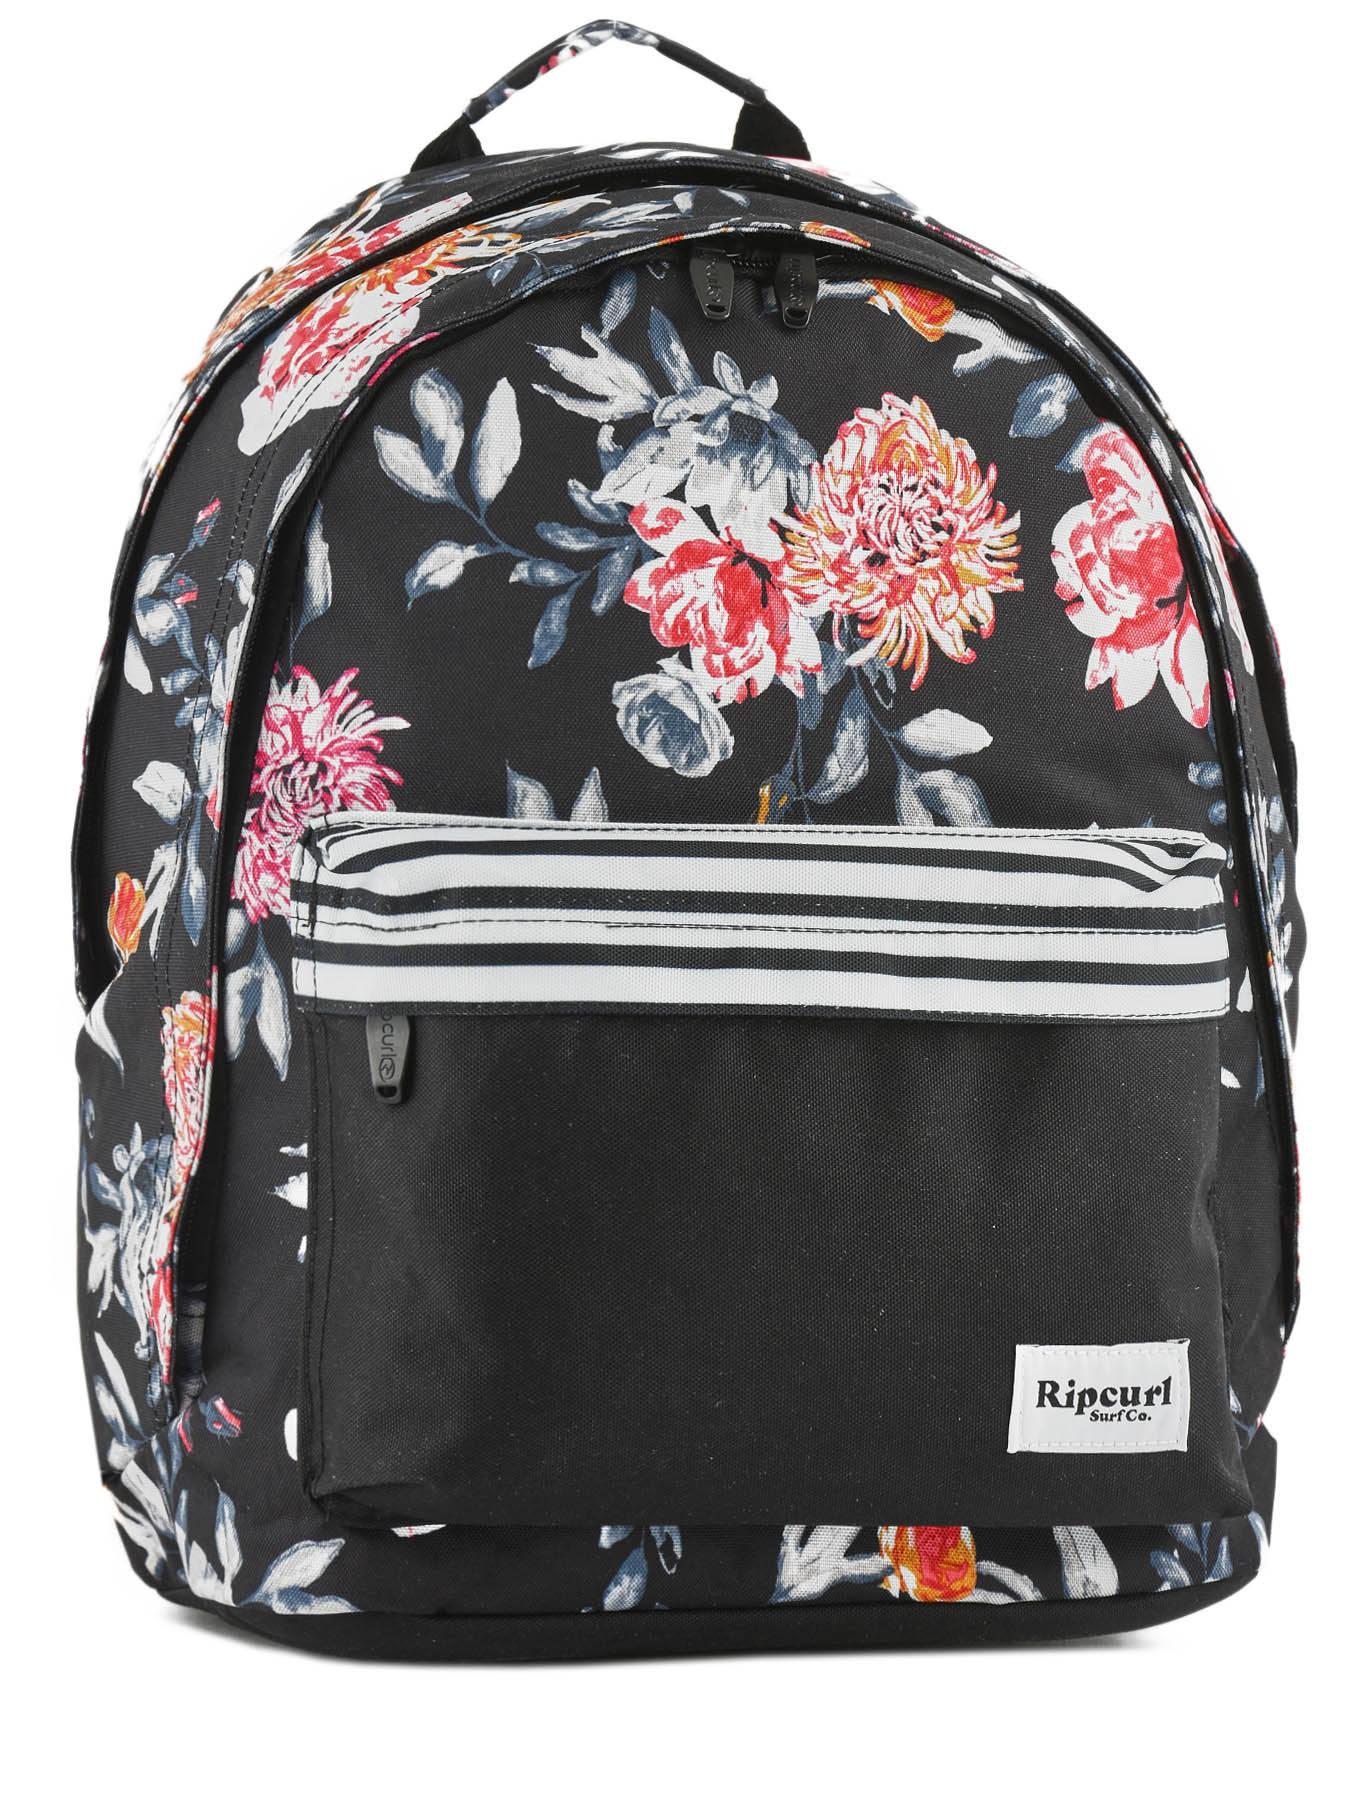 dbd0b6629b363 Backpack 2 Compartments Rip curl Black desert flower LBPHH1 ...